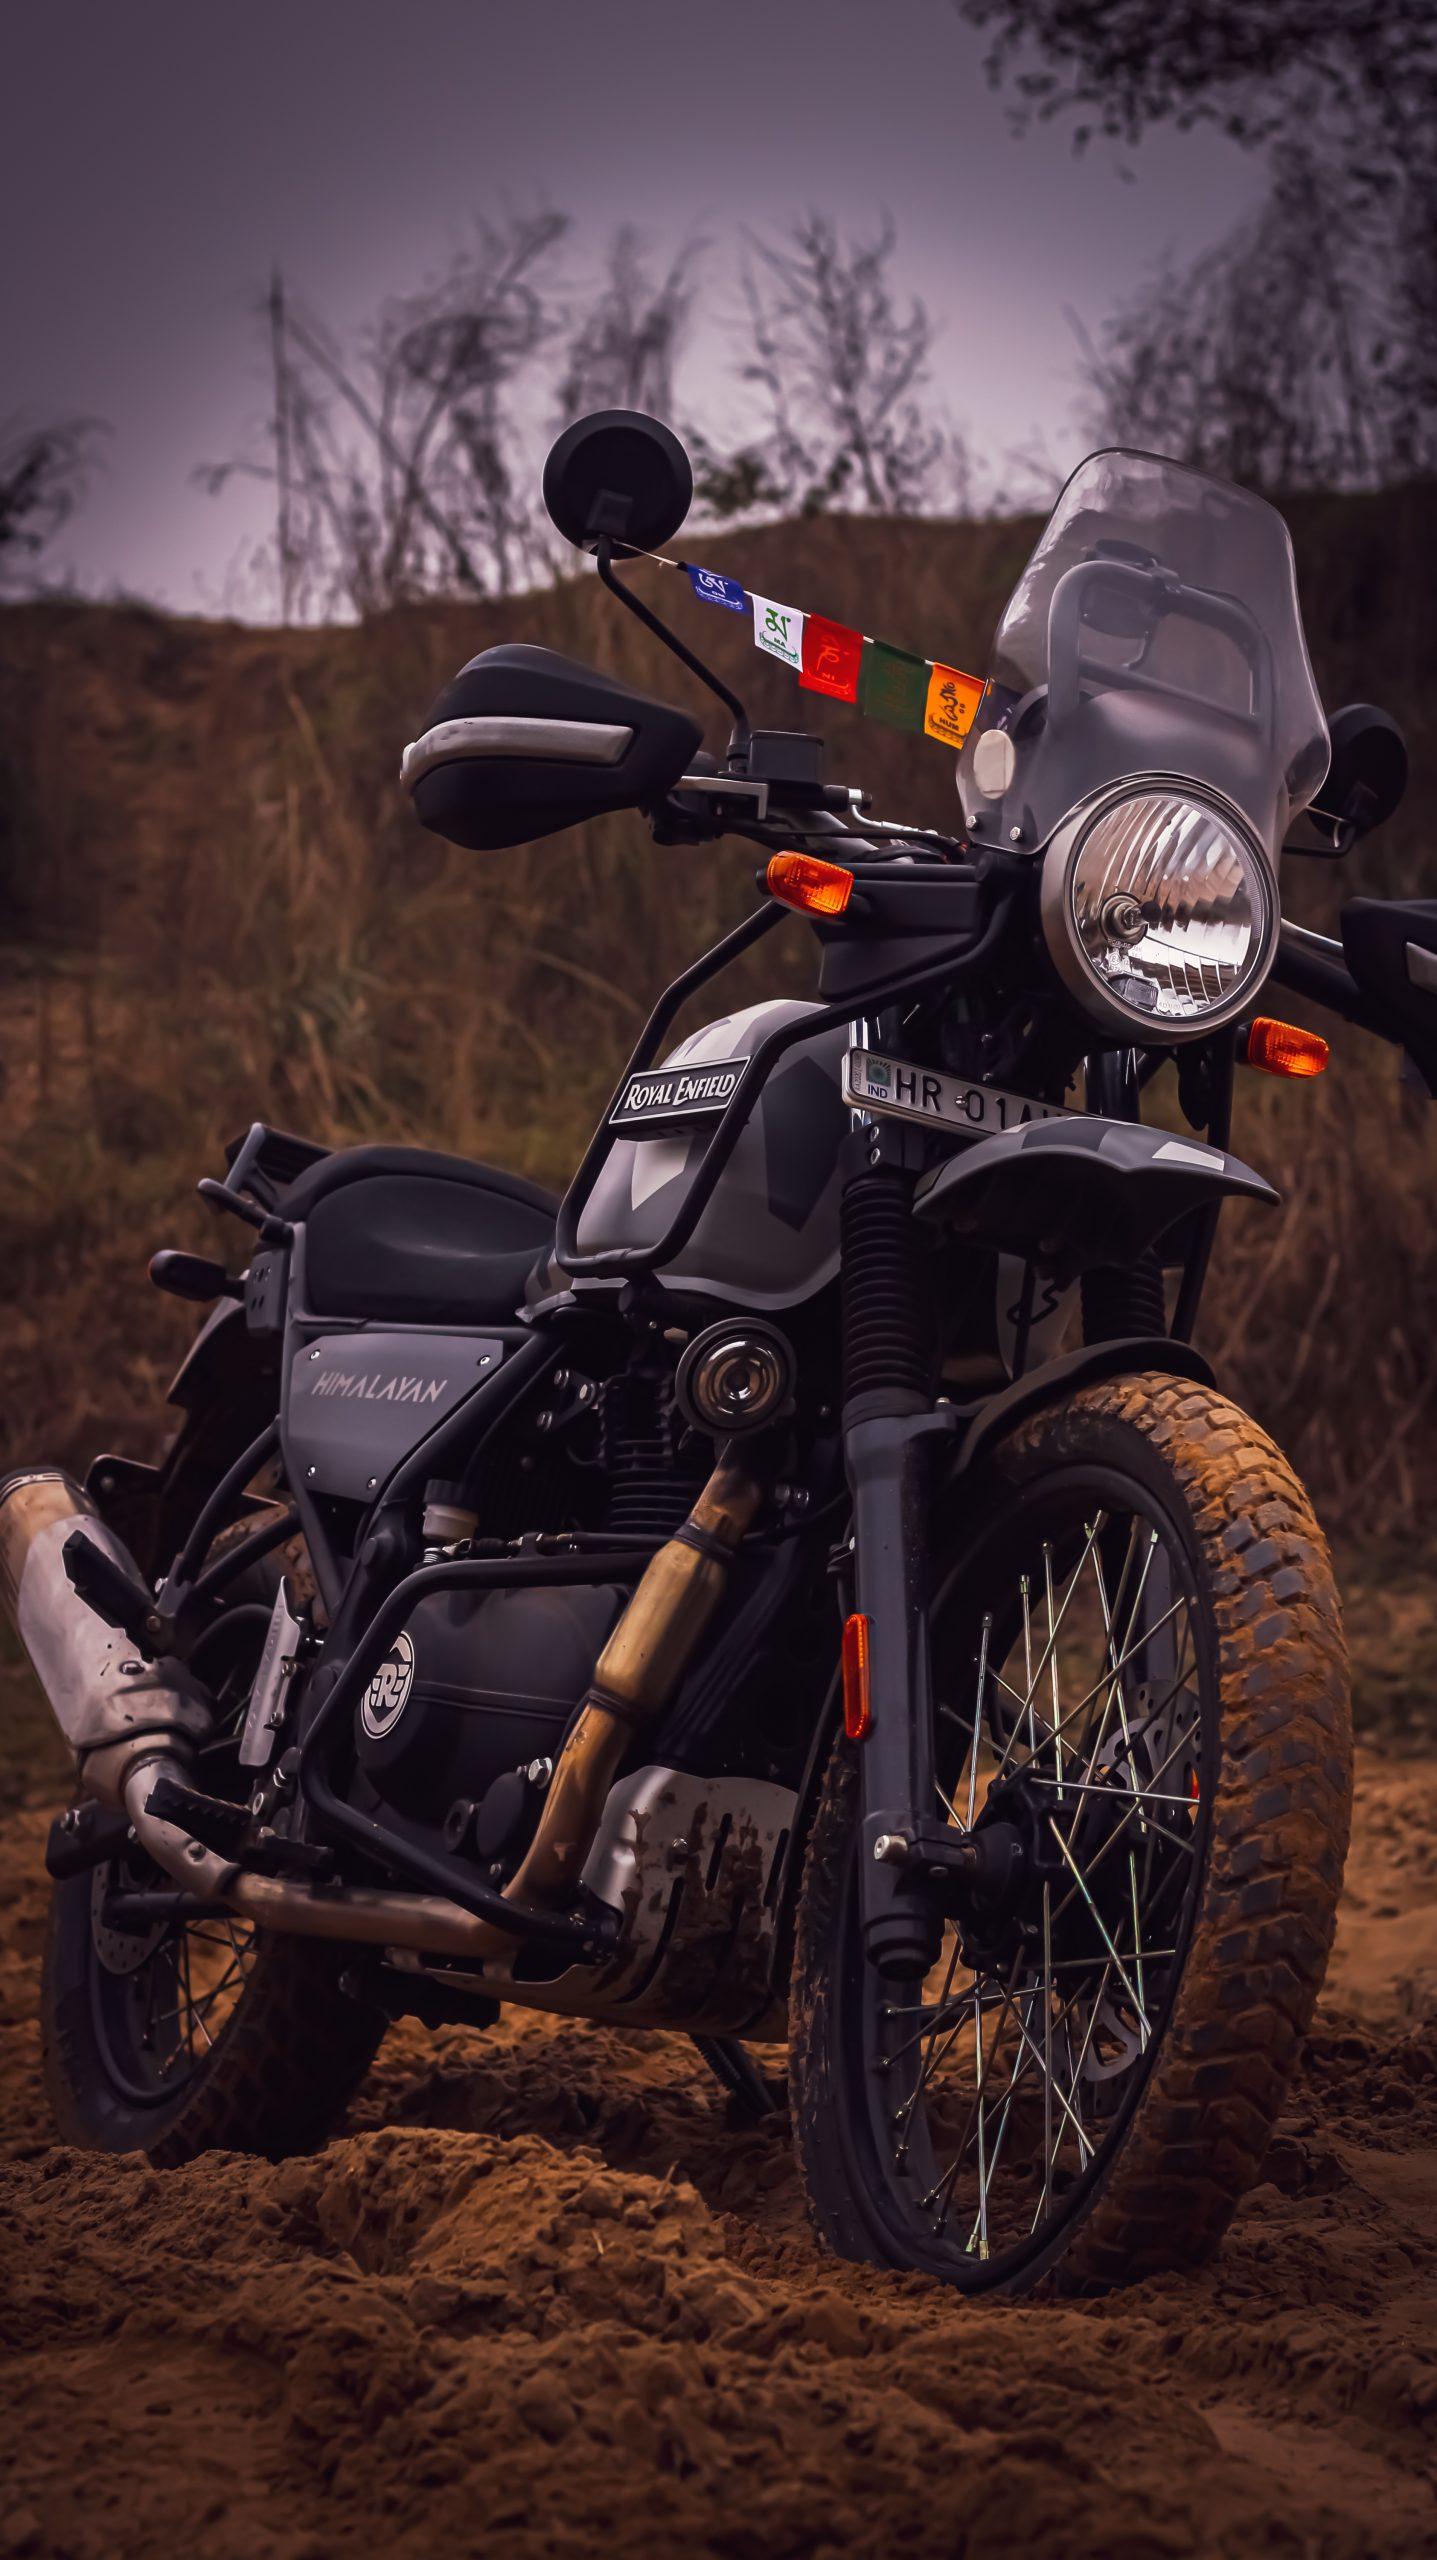 Bike standing in mud